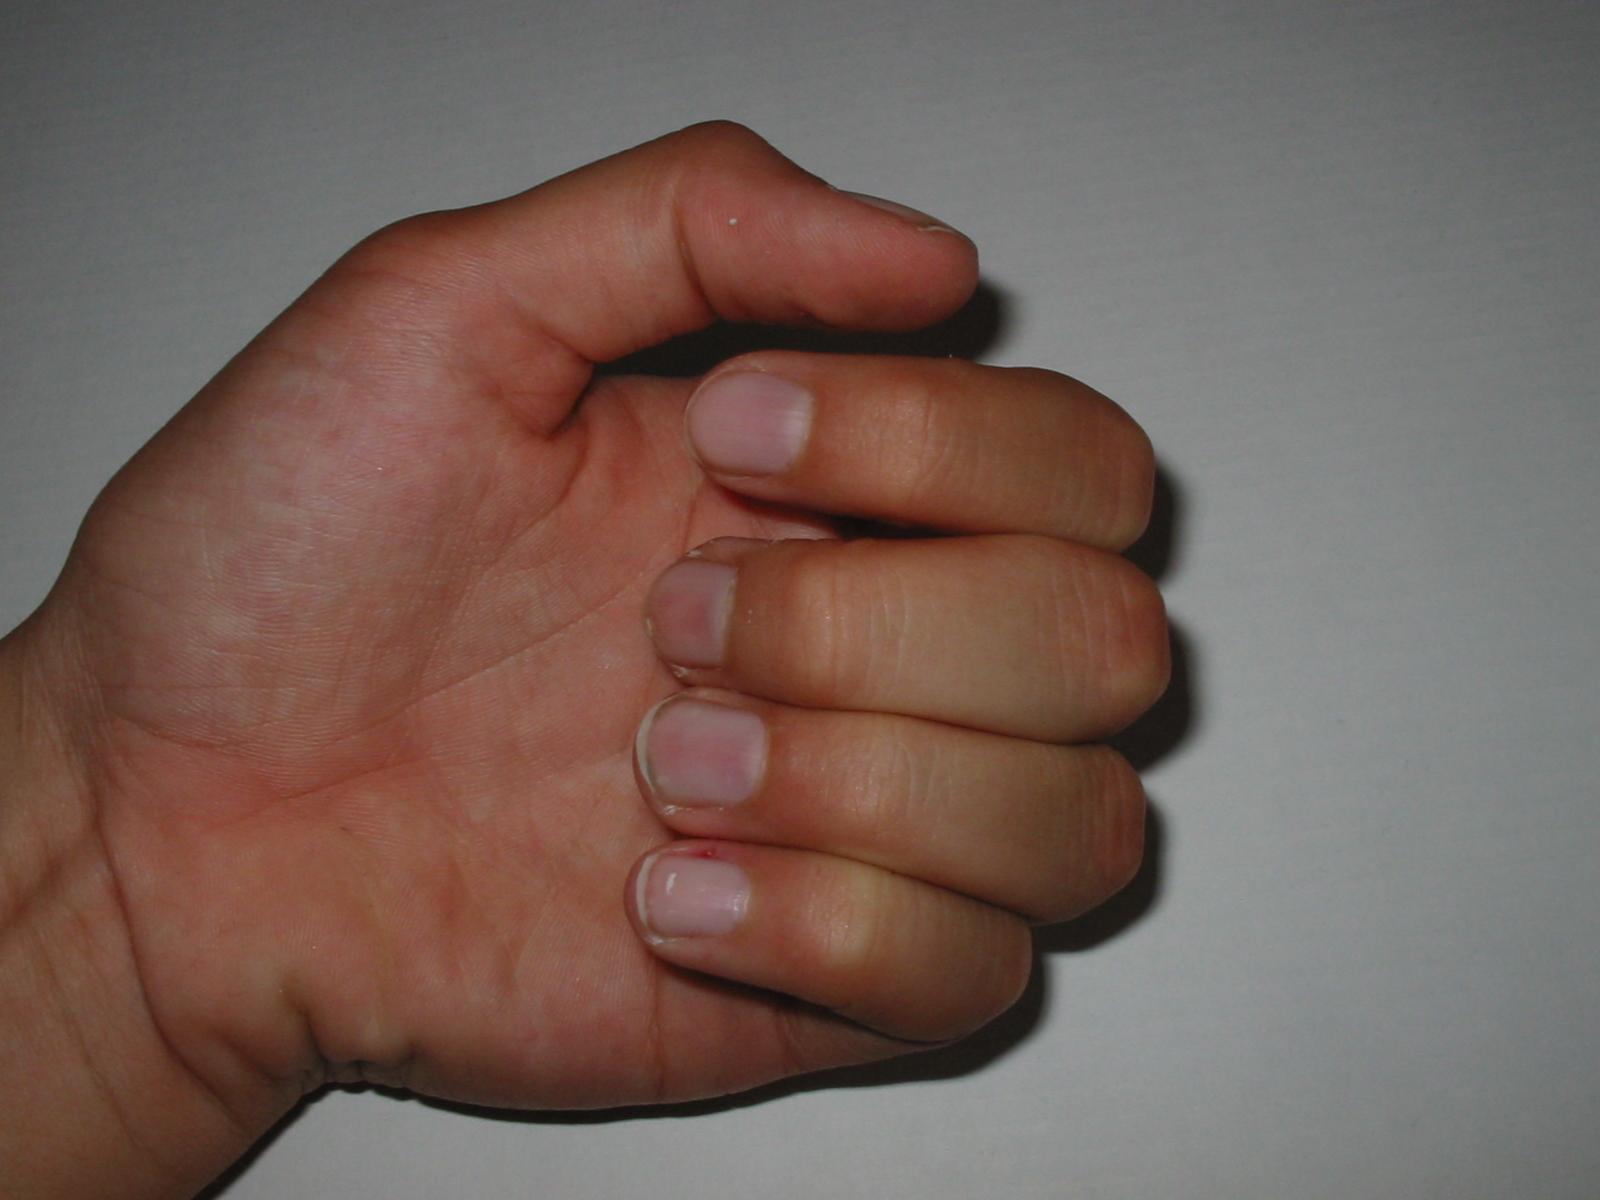 Hand, Bend, Fingers, Five, HQ Photo